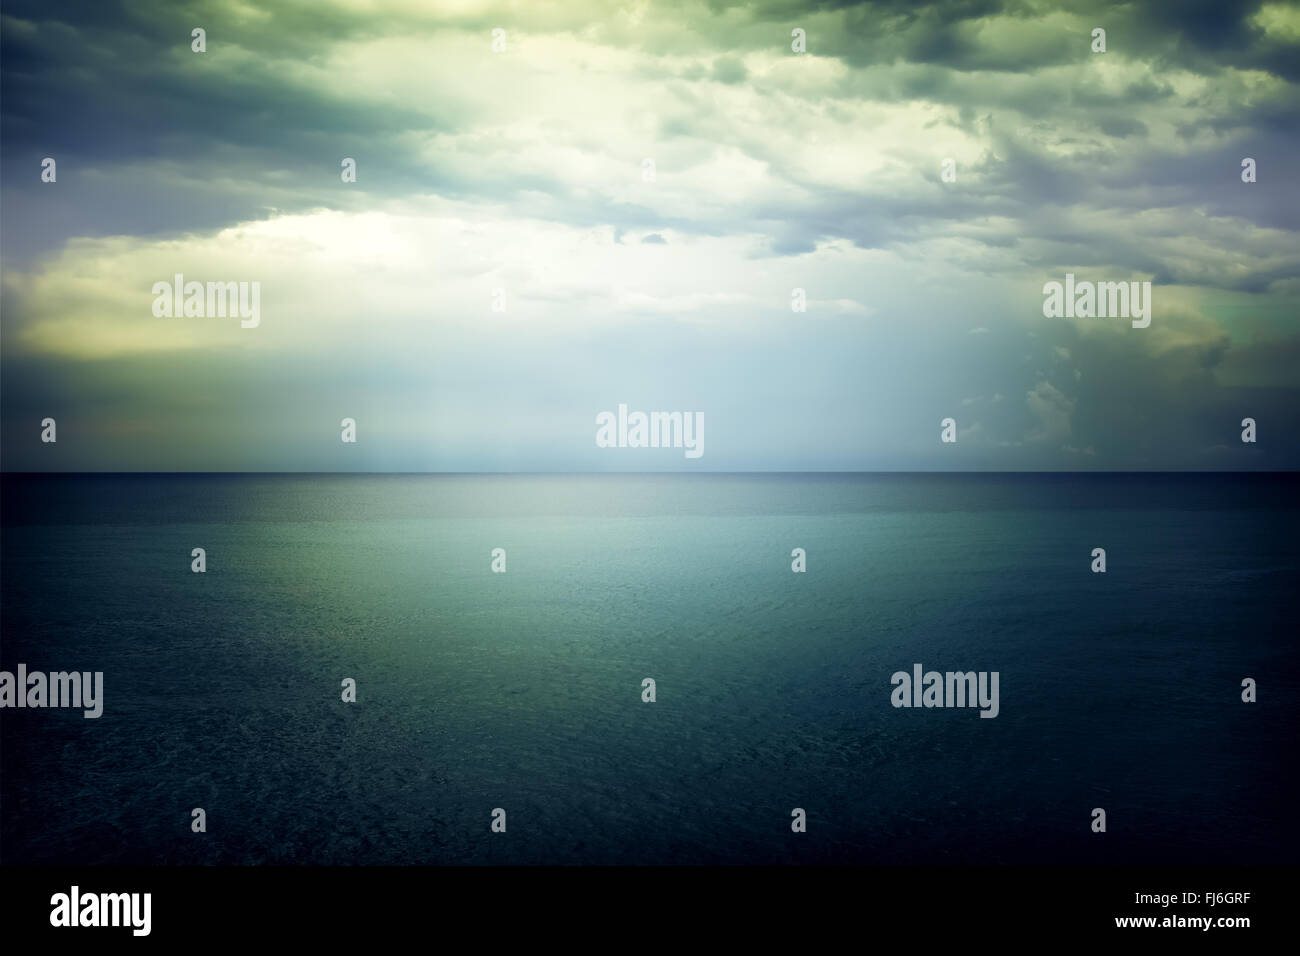 Light in the sky above the gloomy dark blue sea. Mediterranean nature. - Stock Image